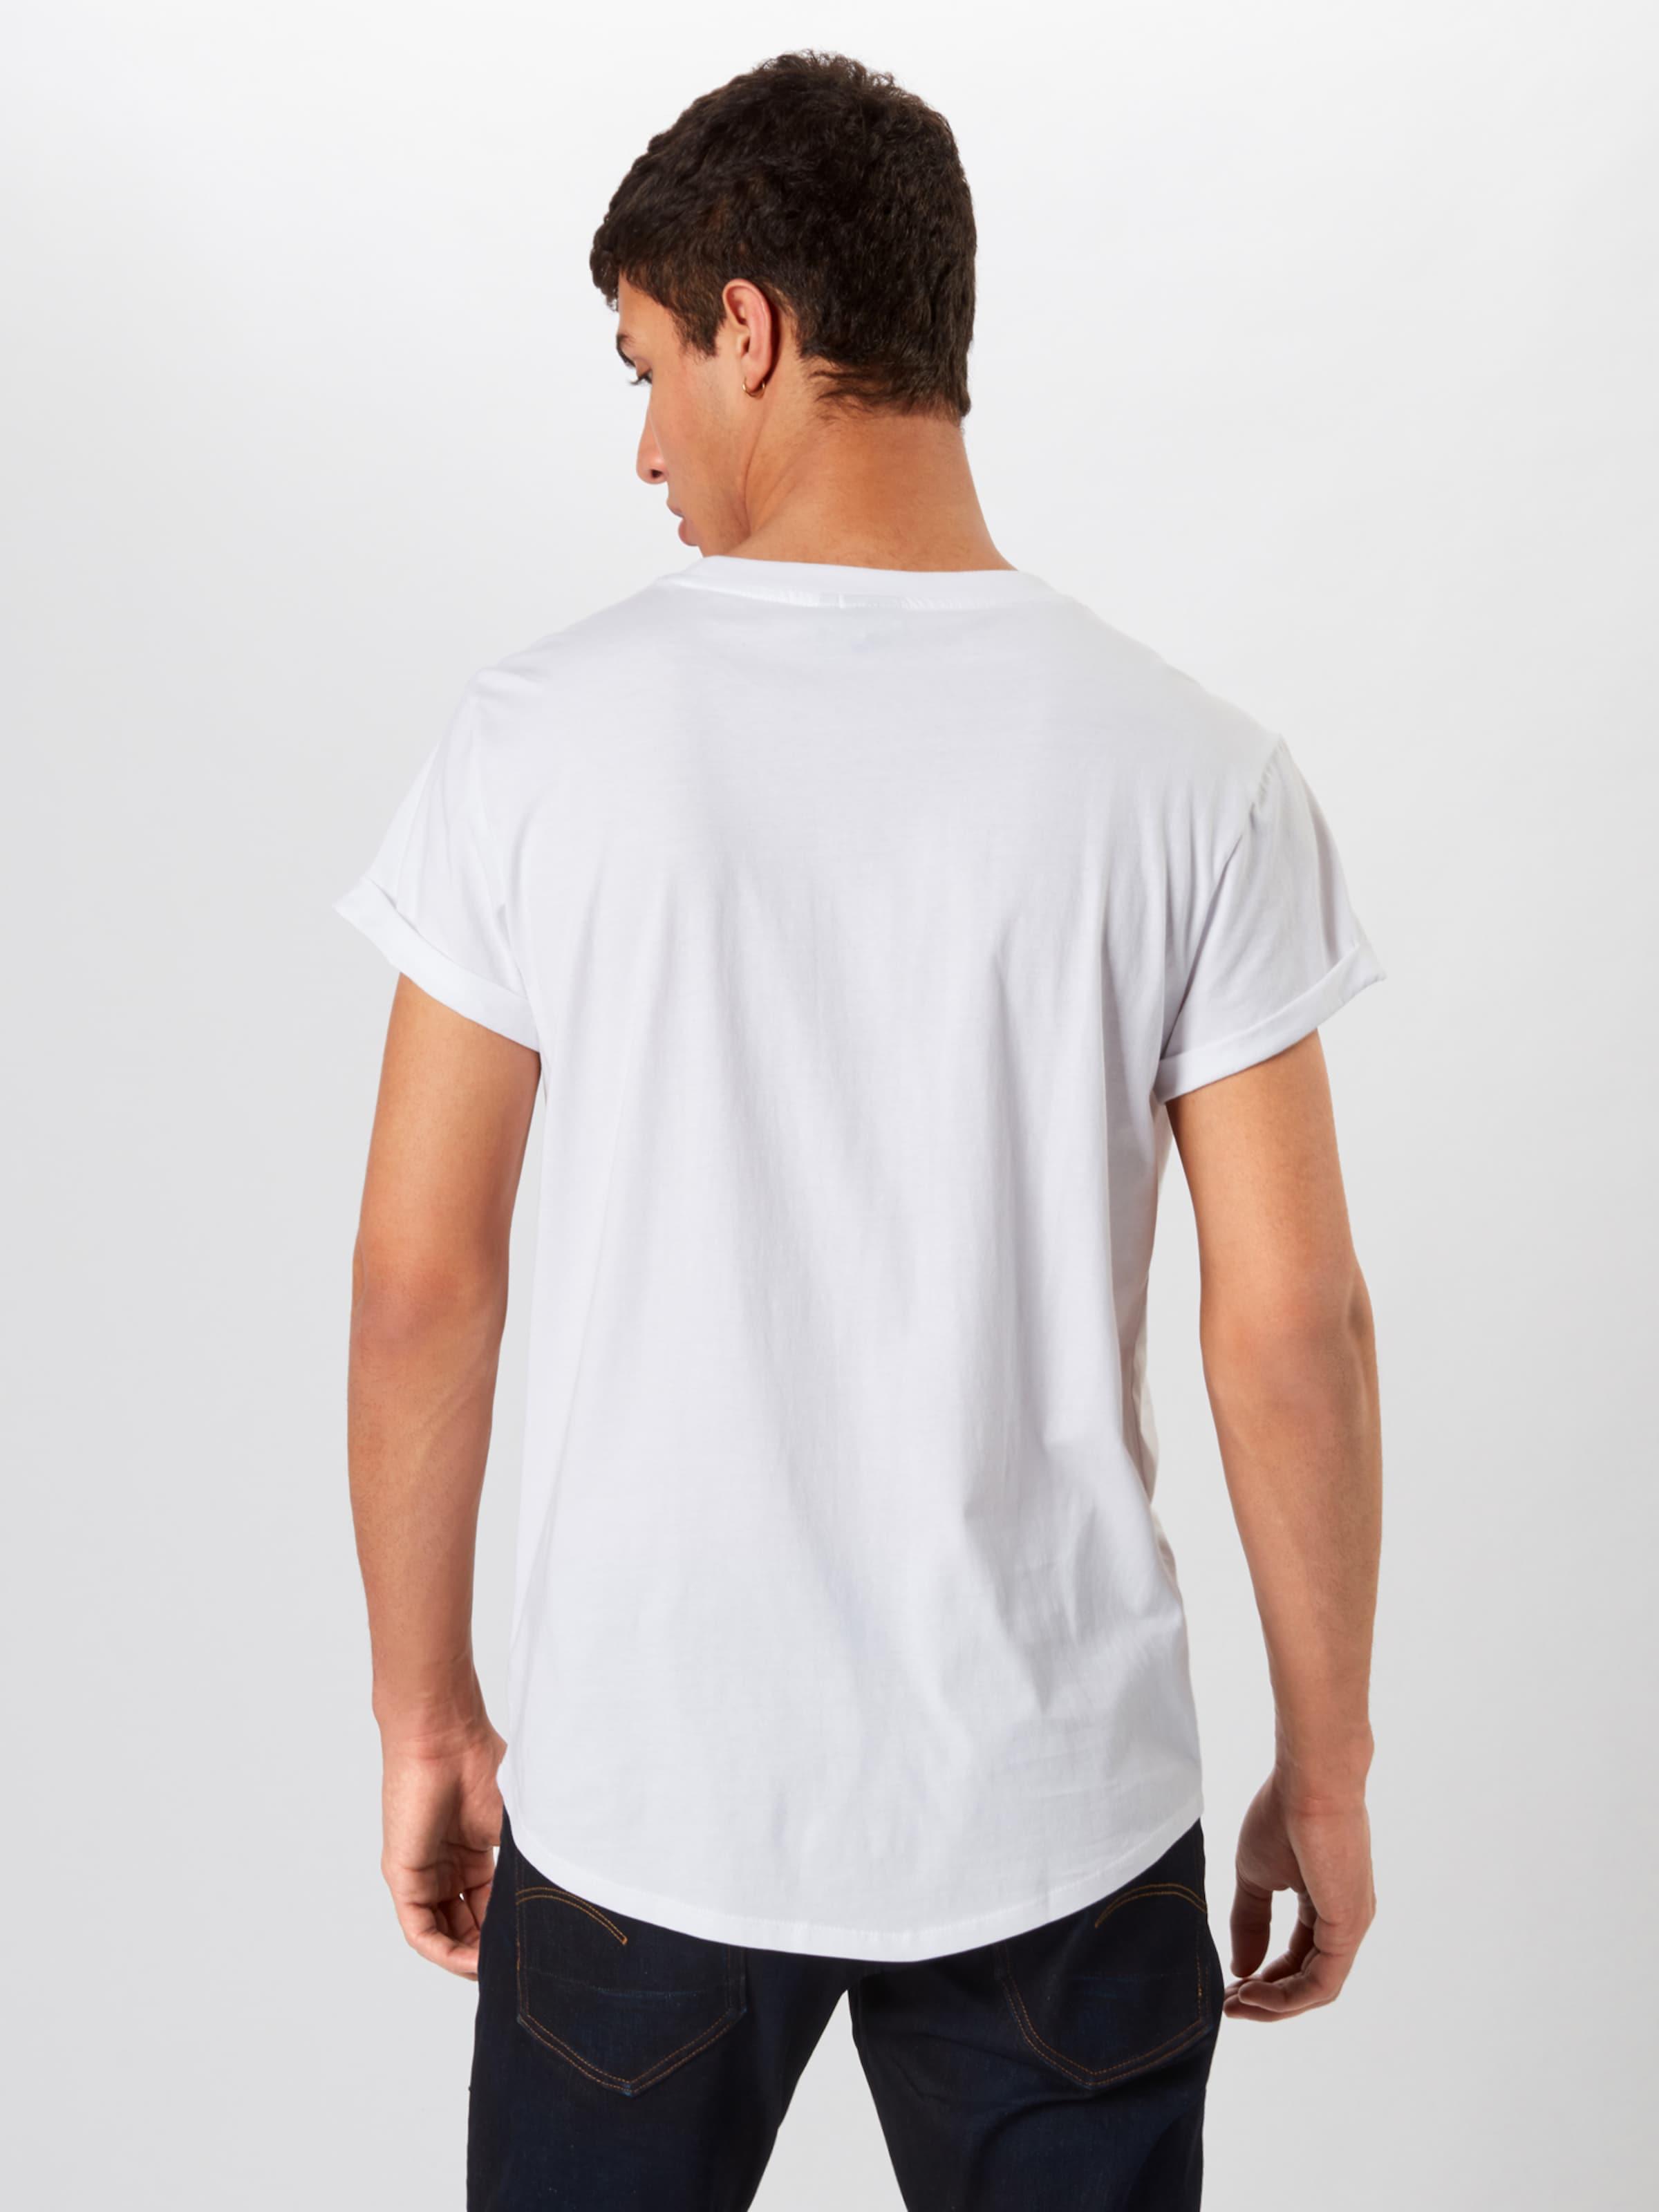 En G shirt Blanc star T Raw l3cFJTK1